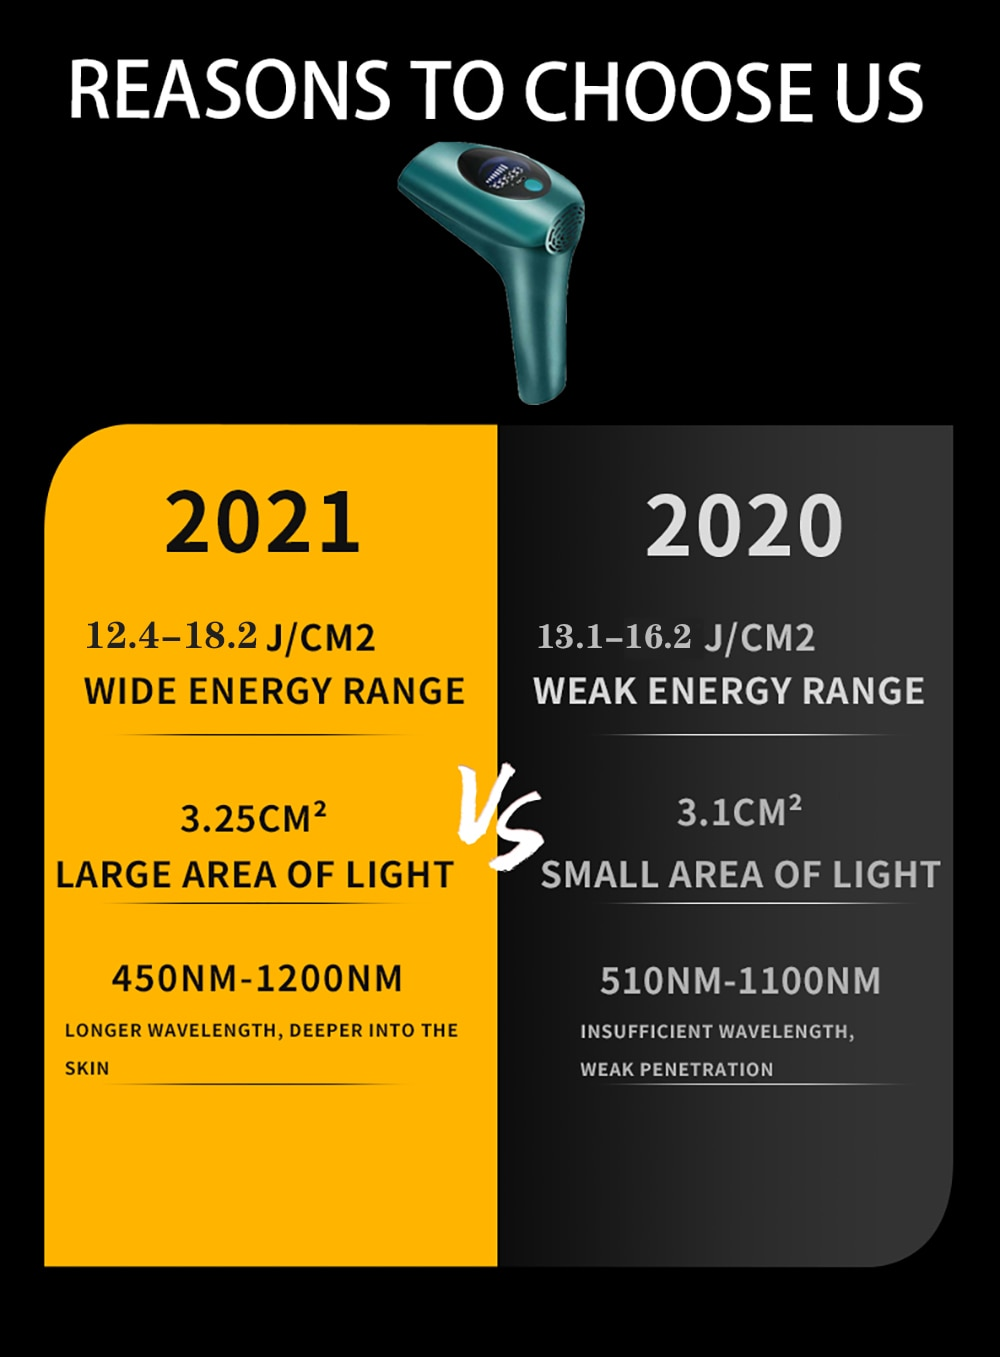 2021New 900000Flashes Laser Epilator Laser Hot Sell  Permanent IPL Photoepilator Hair Removal Painless Electric Epilator Machine enlarge